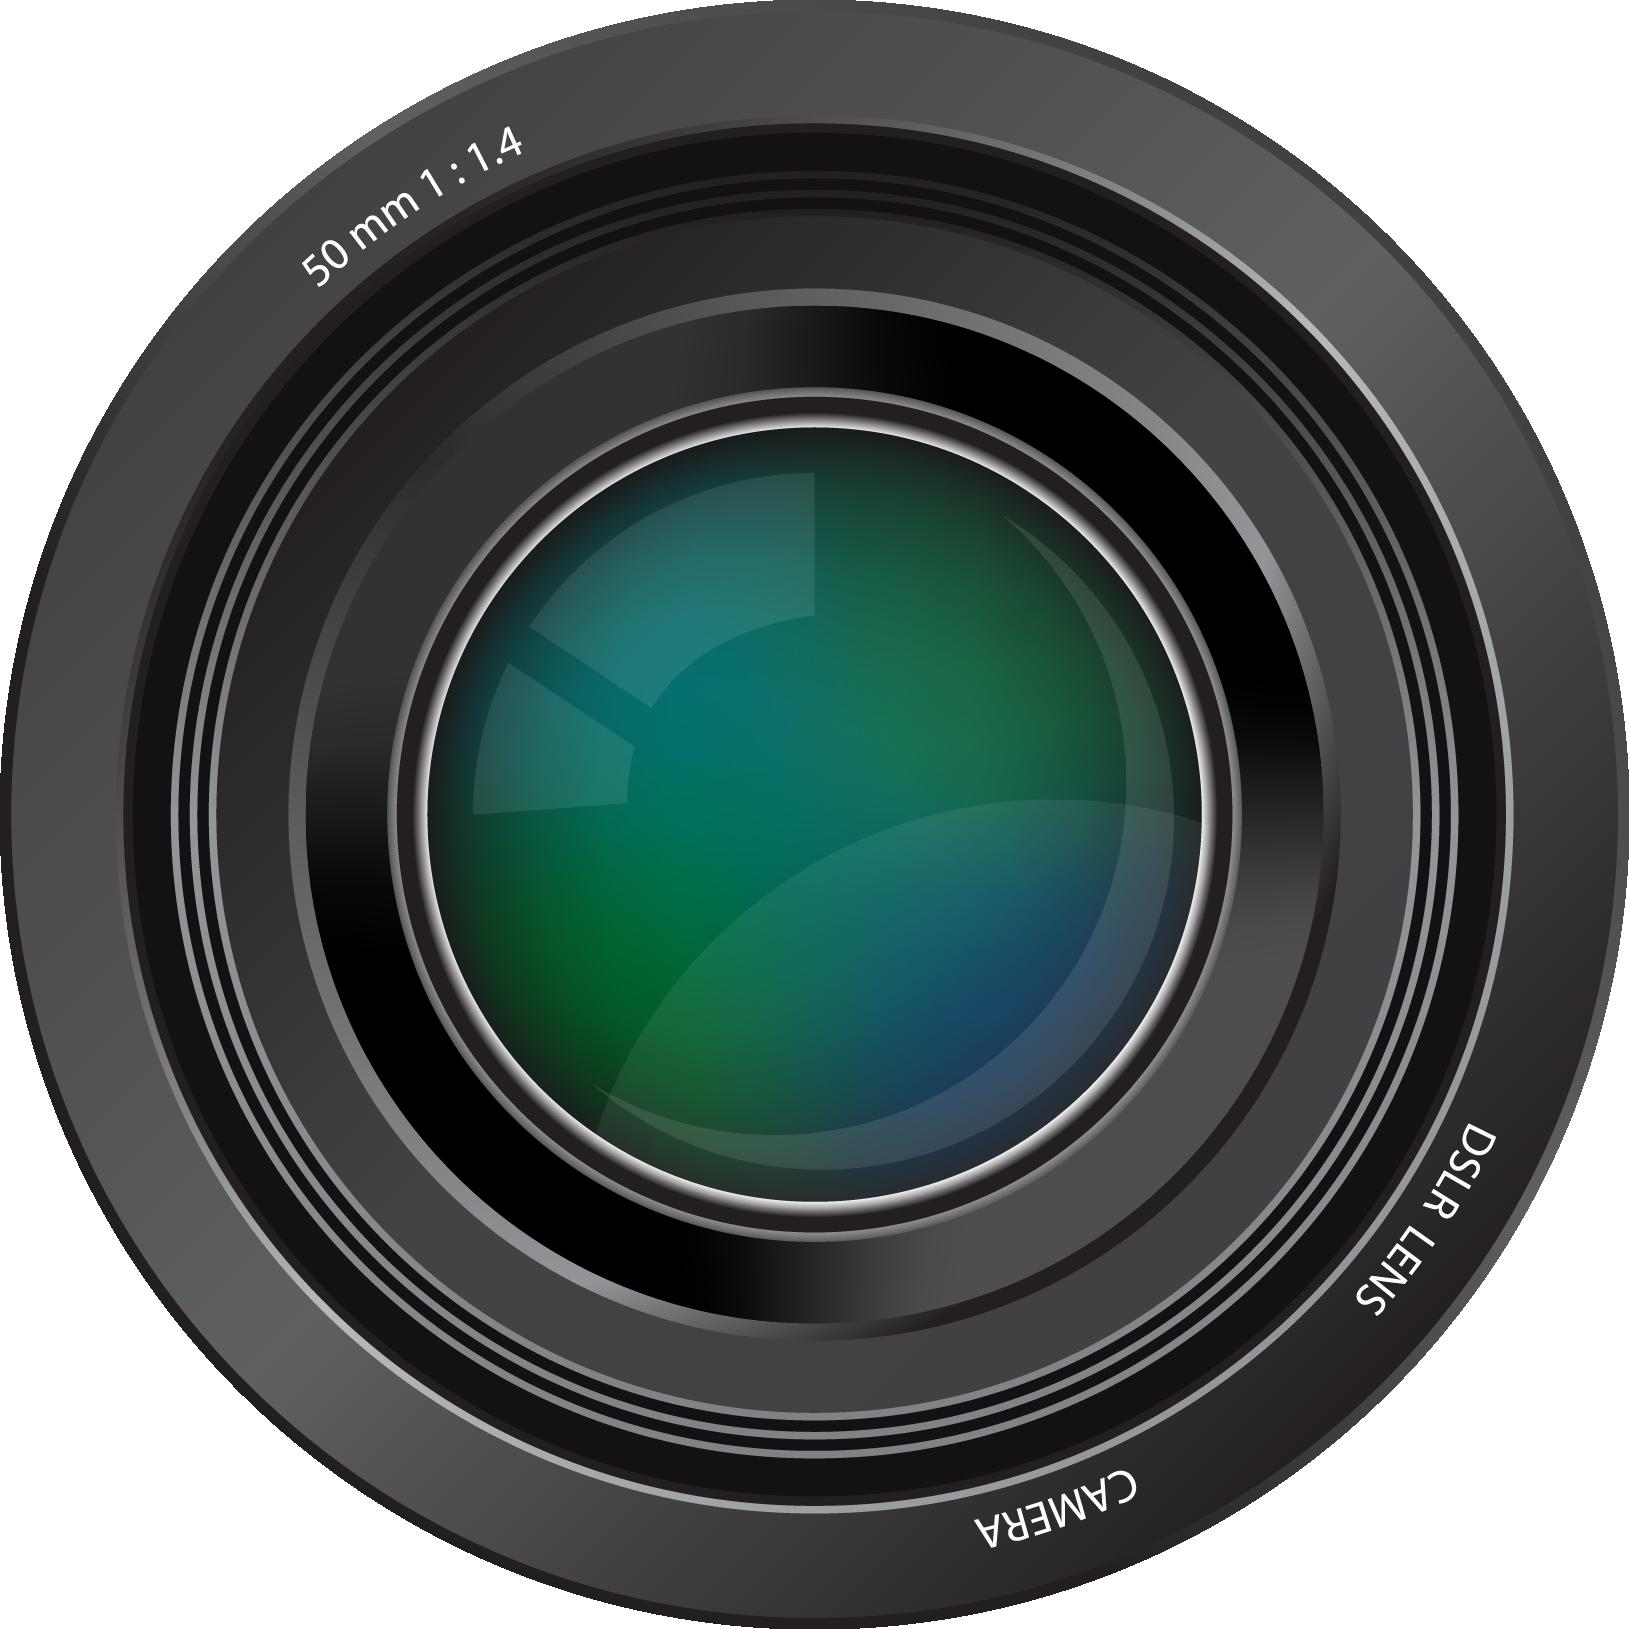 Camera lens free to use clip art.